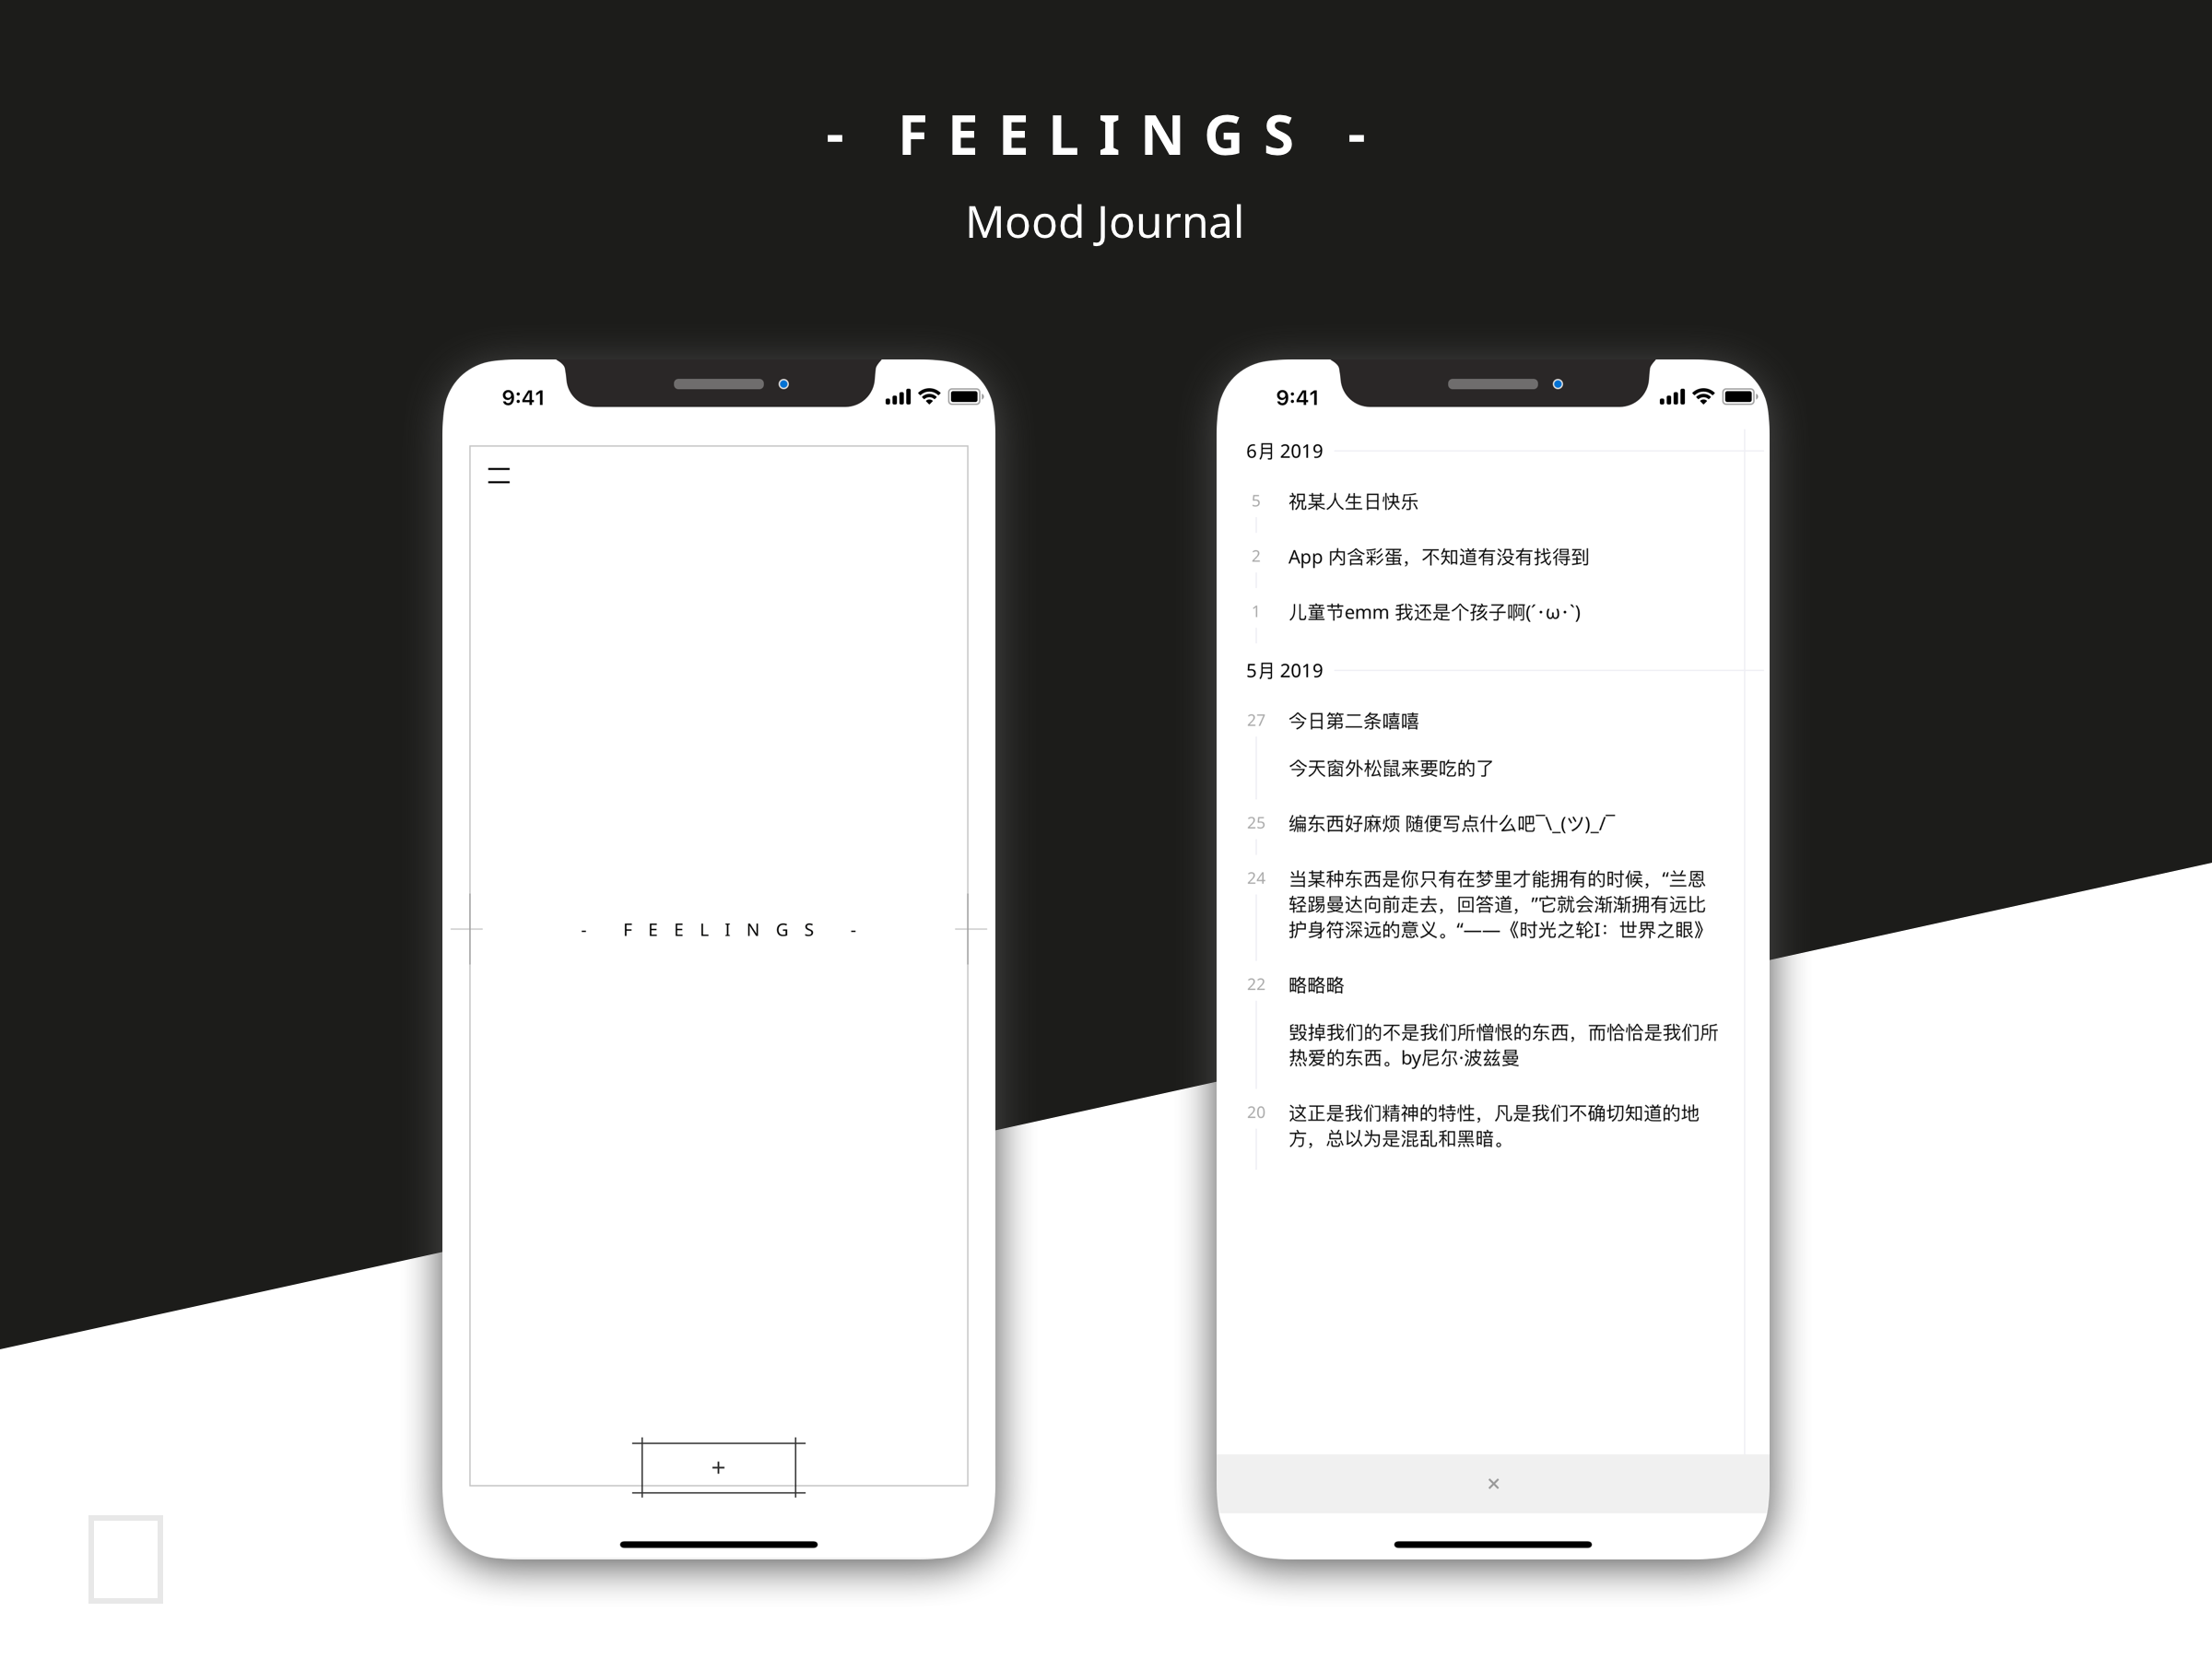 Feelings - Mood Journal App